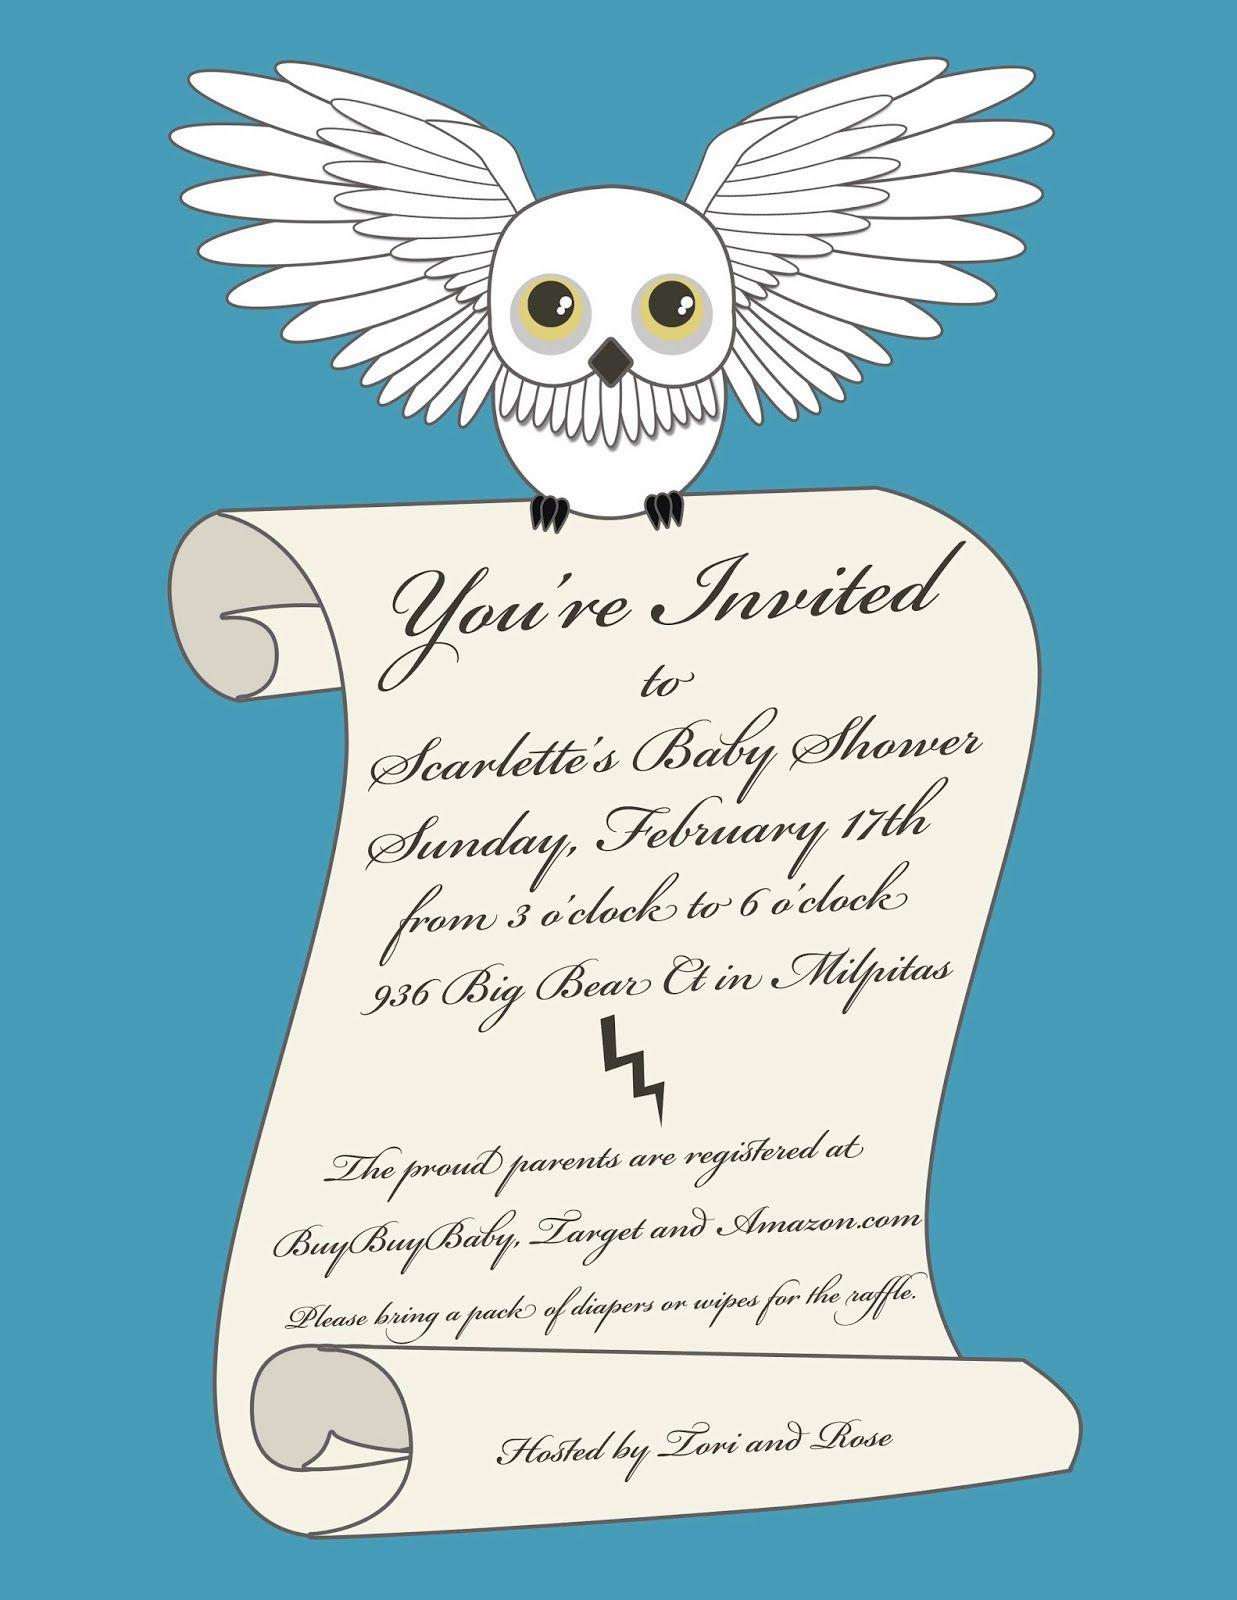 NotoriousStar Designs: Harry Potter Baby Shower Invitation | Brandis ...